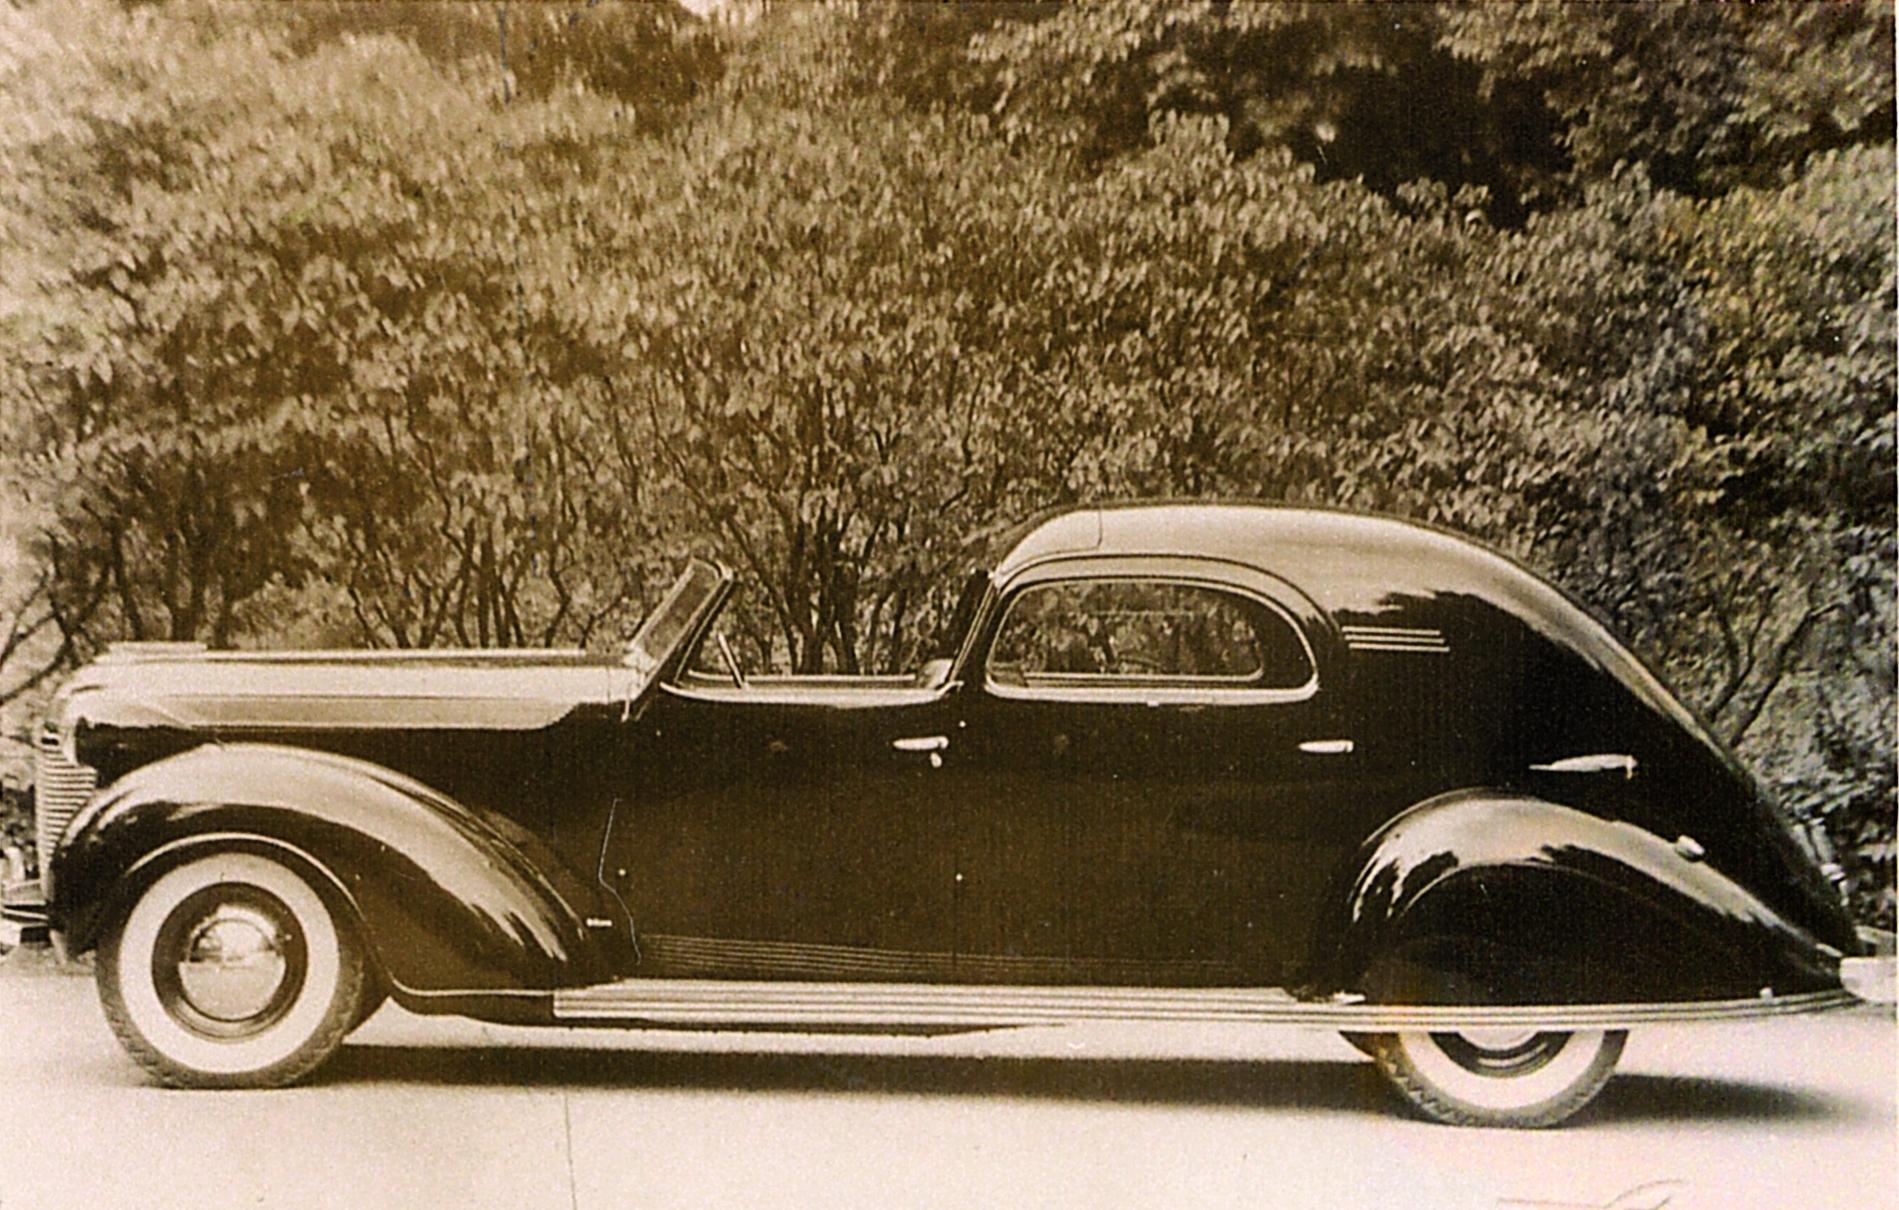 1937-Chrysler-Imperial-Model-C-15-Town-Car | The Old Motor